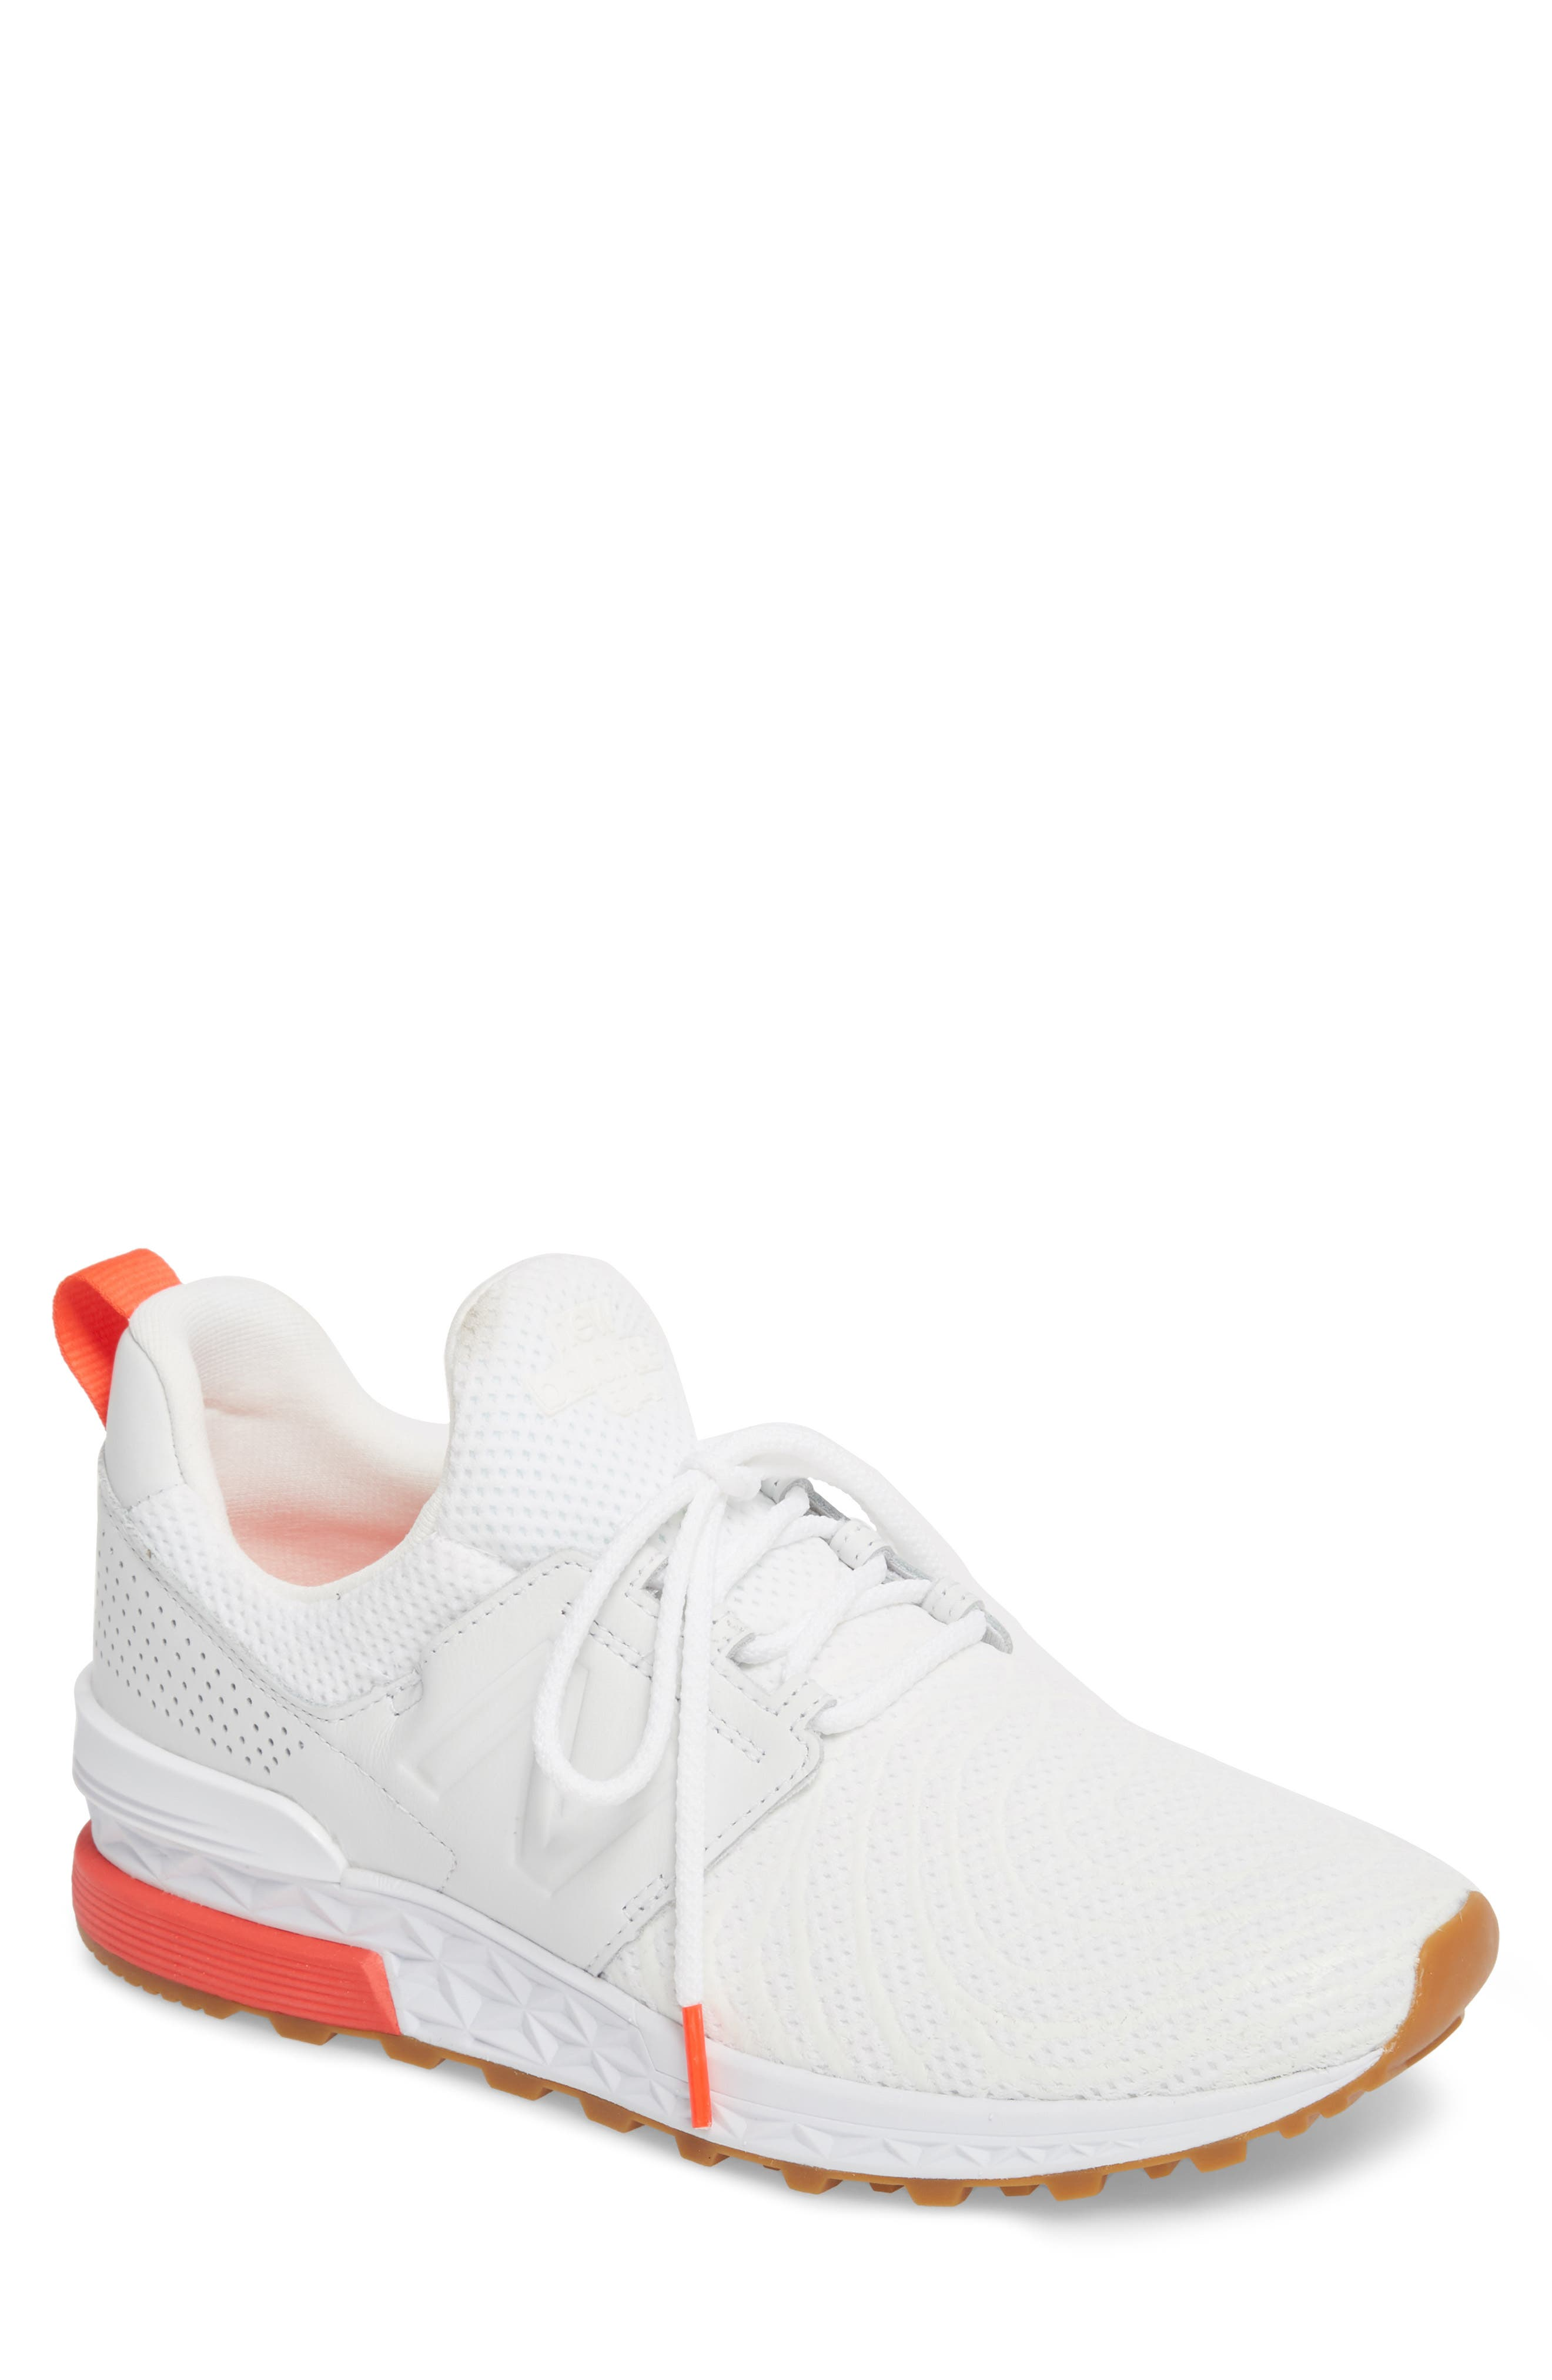 574 Sport Sneaker,                         Main,                         color, White